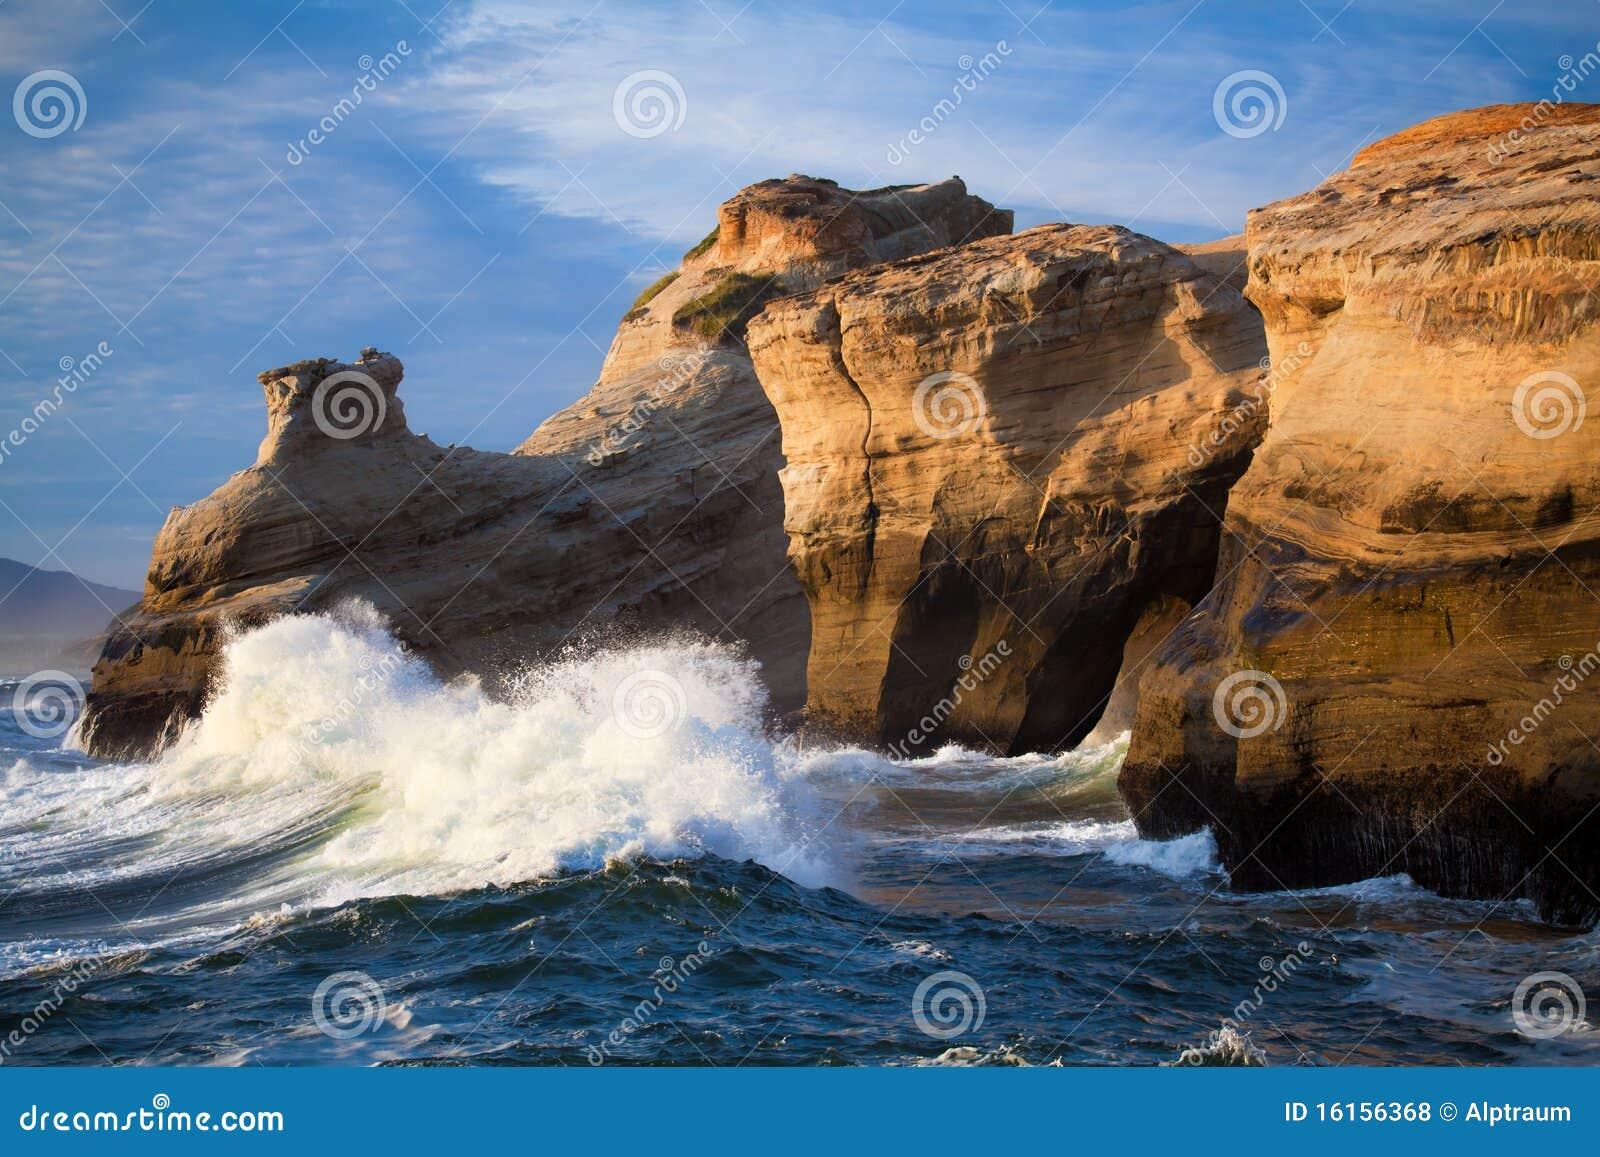 Ocean waves landscape - Oregon coast